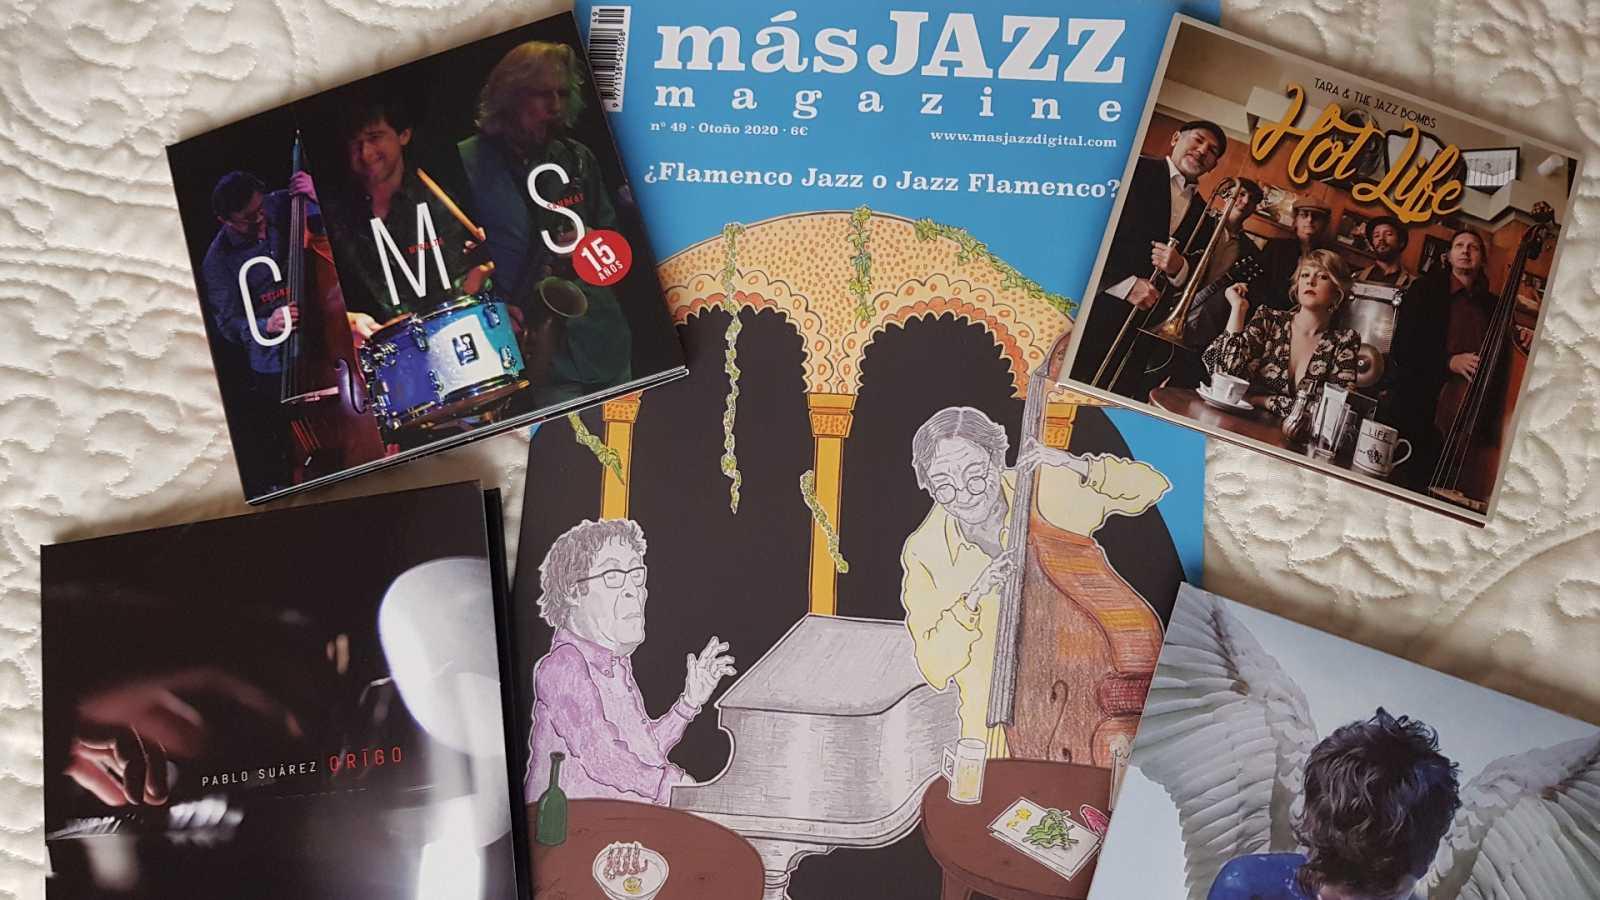 Discópolis - 11.114: CMS, Tara Lowe, Más Jazz - 23/10/20 - escuchar ahora